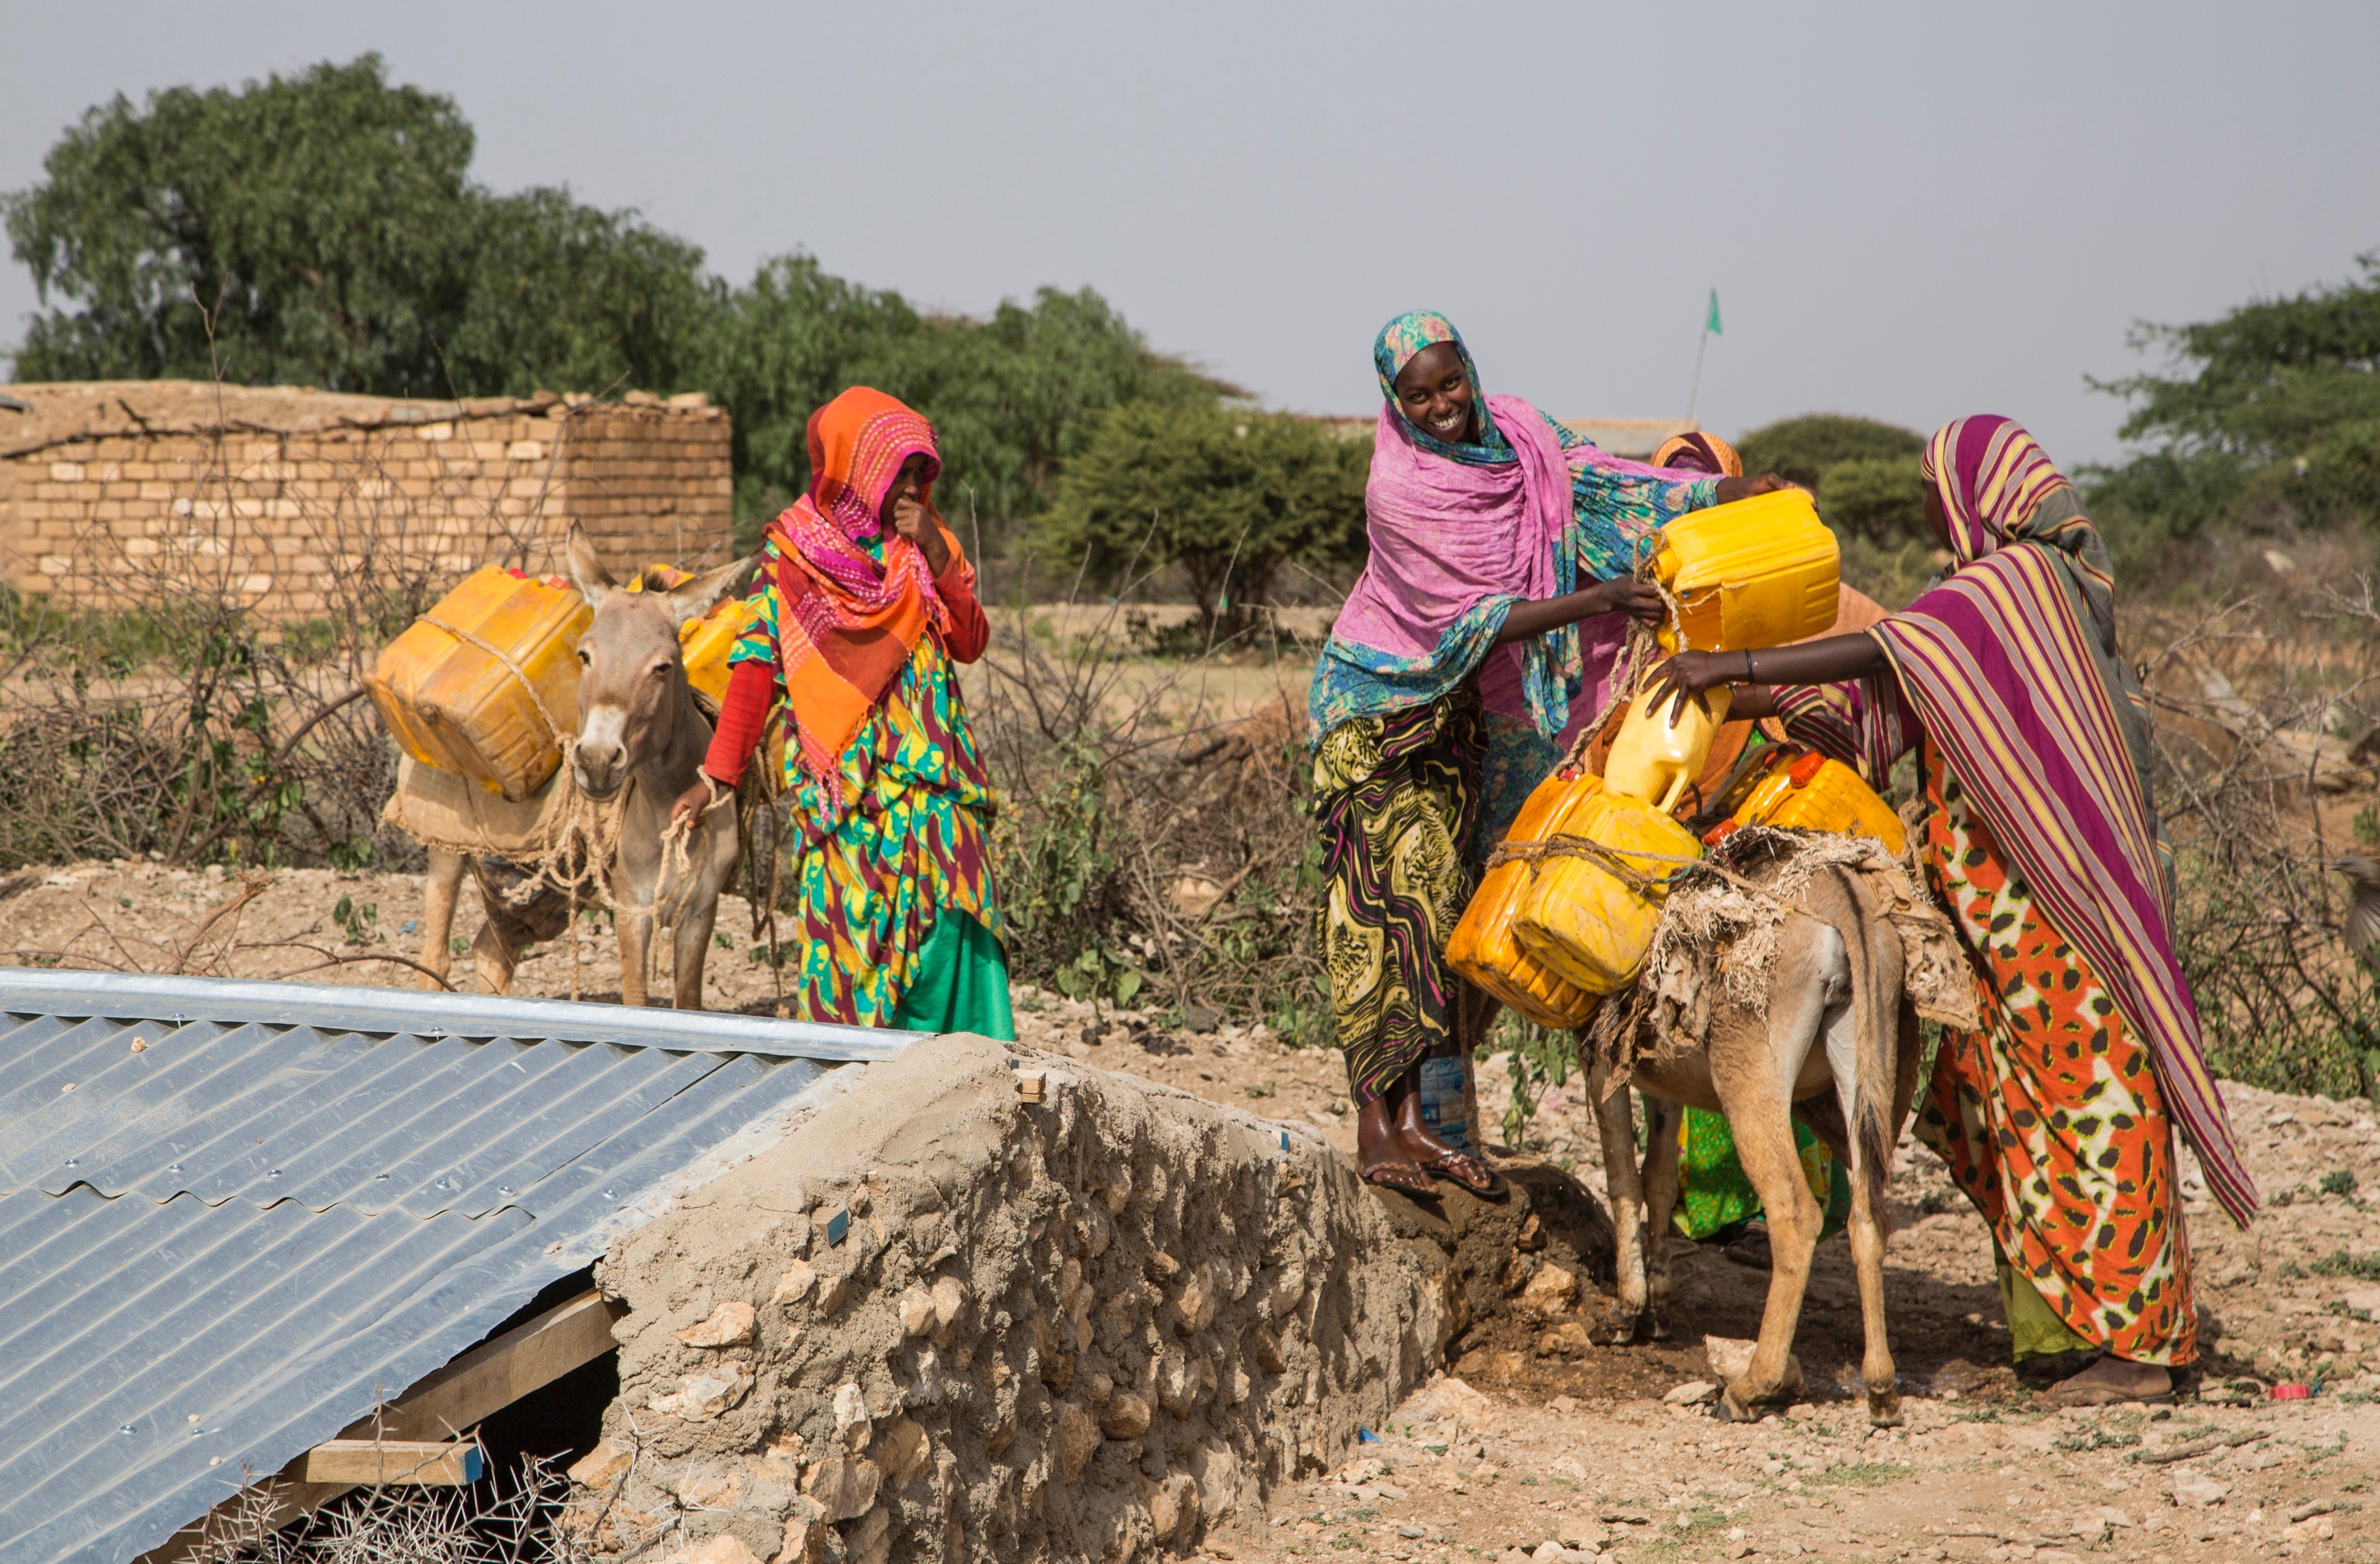 SOMALI WOMEN FETCH WATER